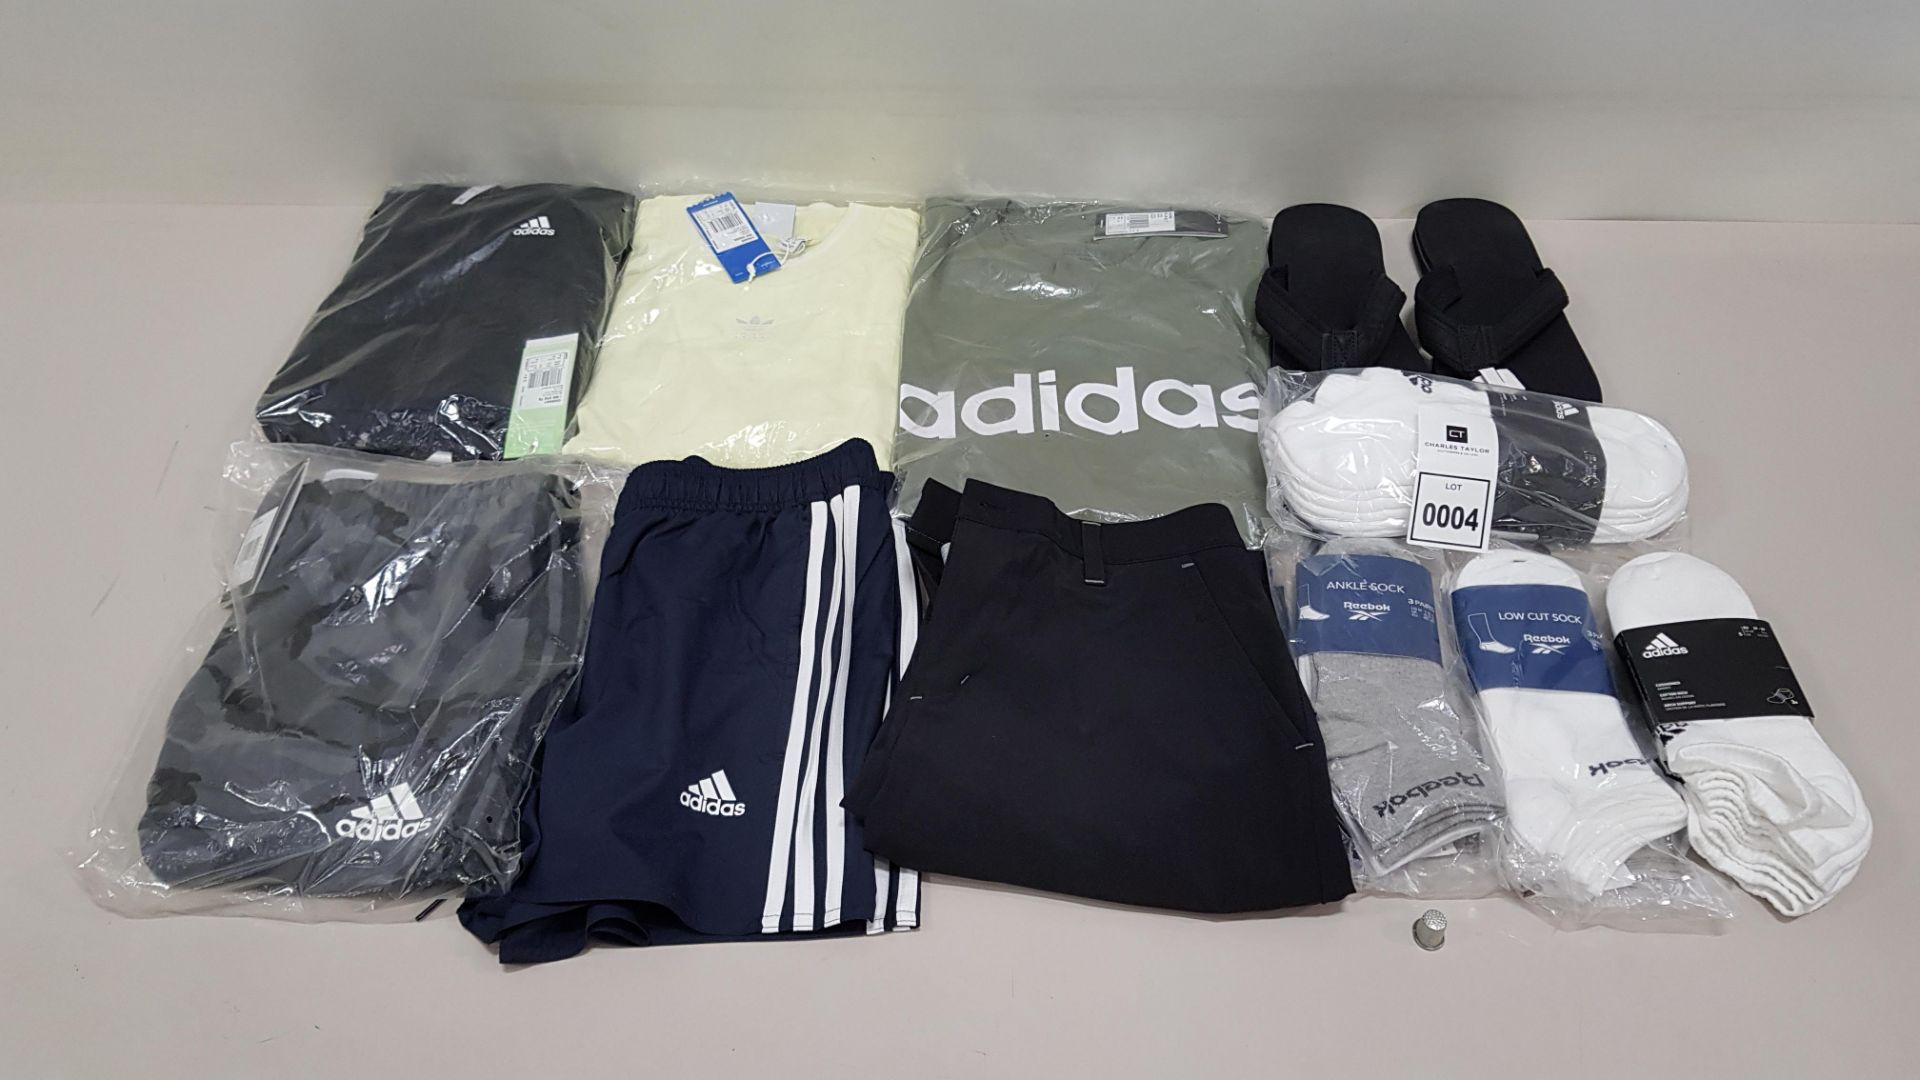 11 PIECE CLOTHING LOT CONTAINING REEBOK & ADIDAS SOCKS, ADIDAS SHORTS, ADIDAS PANTS AND AN ADIDAS